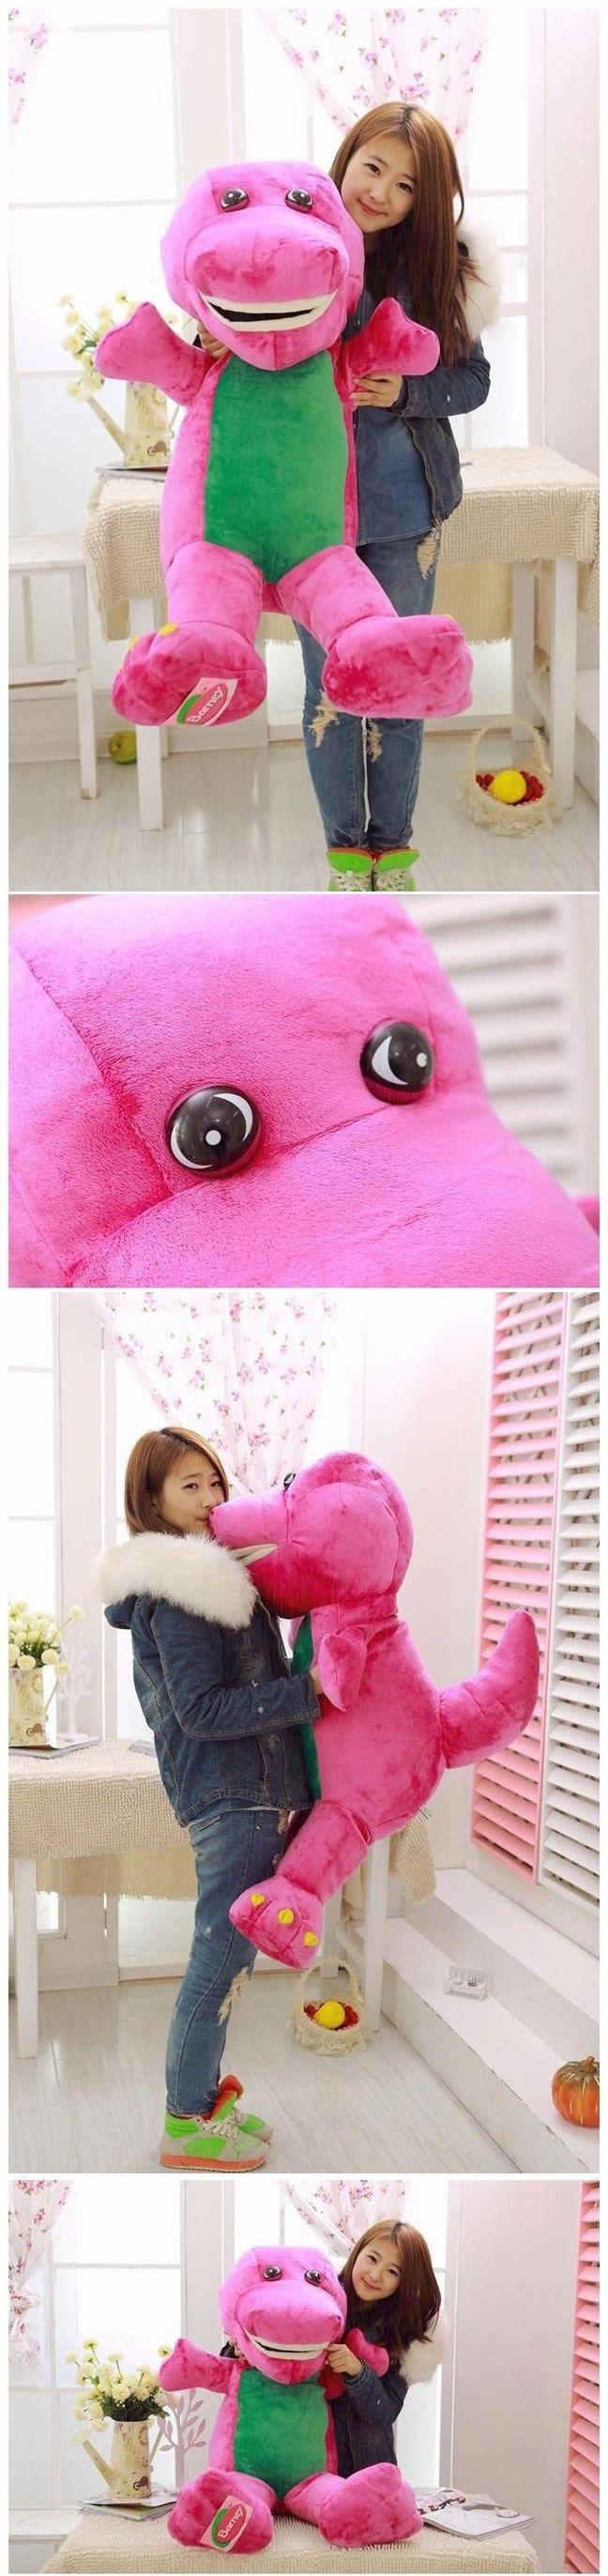 Barney 2625: 90Cm Gaint Big Barney The Dinosaur Plush Soft Kid Baby Toys Doll Pillow Gift -> BUY IT NOW ONLY: $67.45 on eBay!